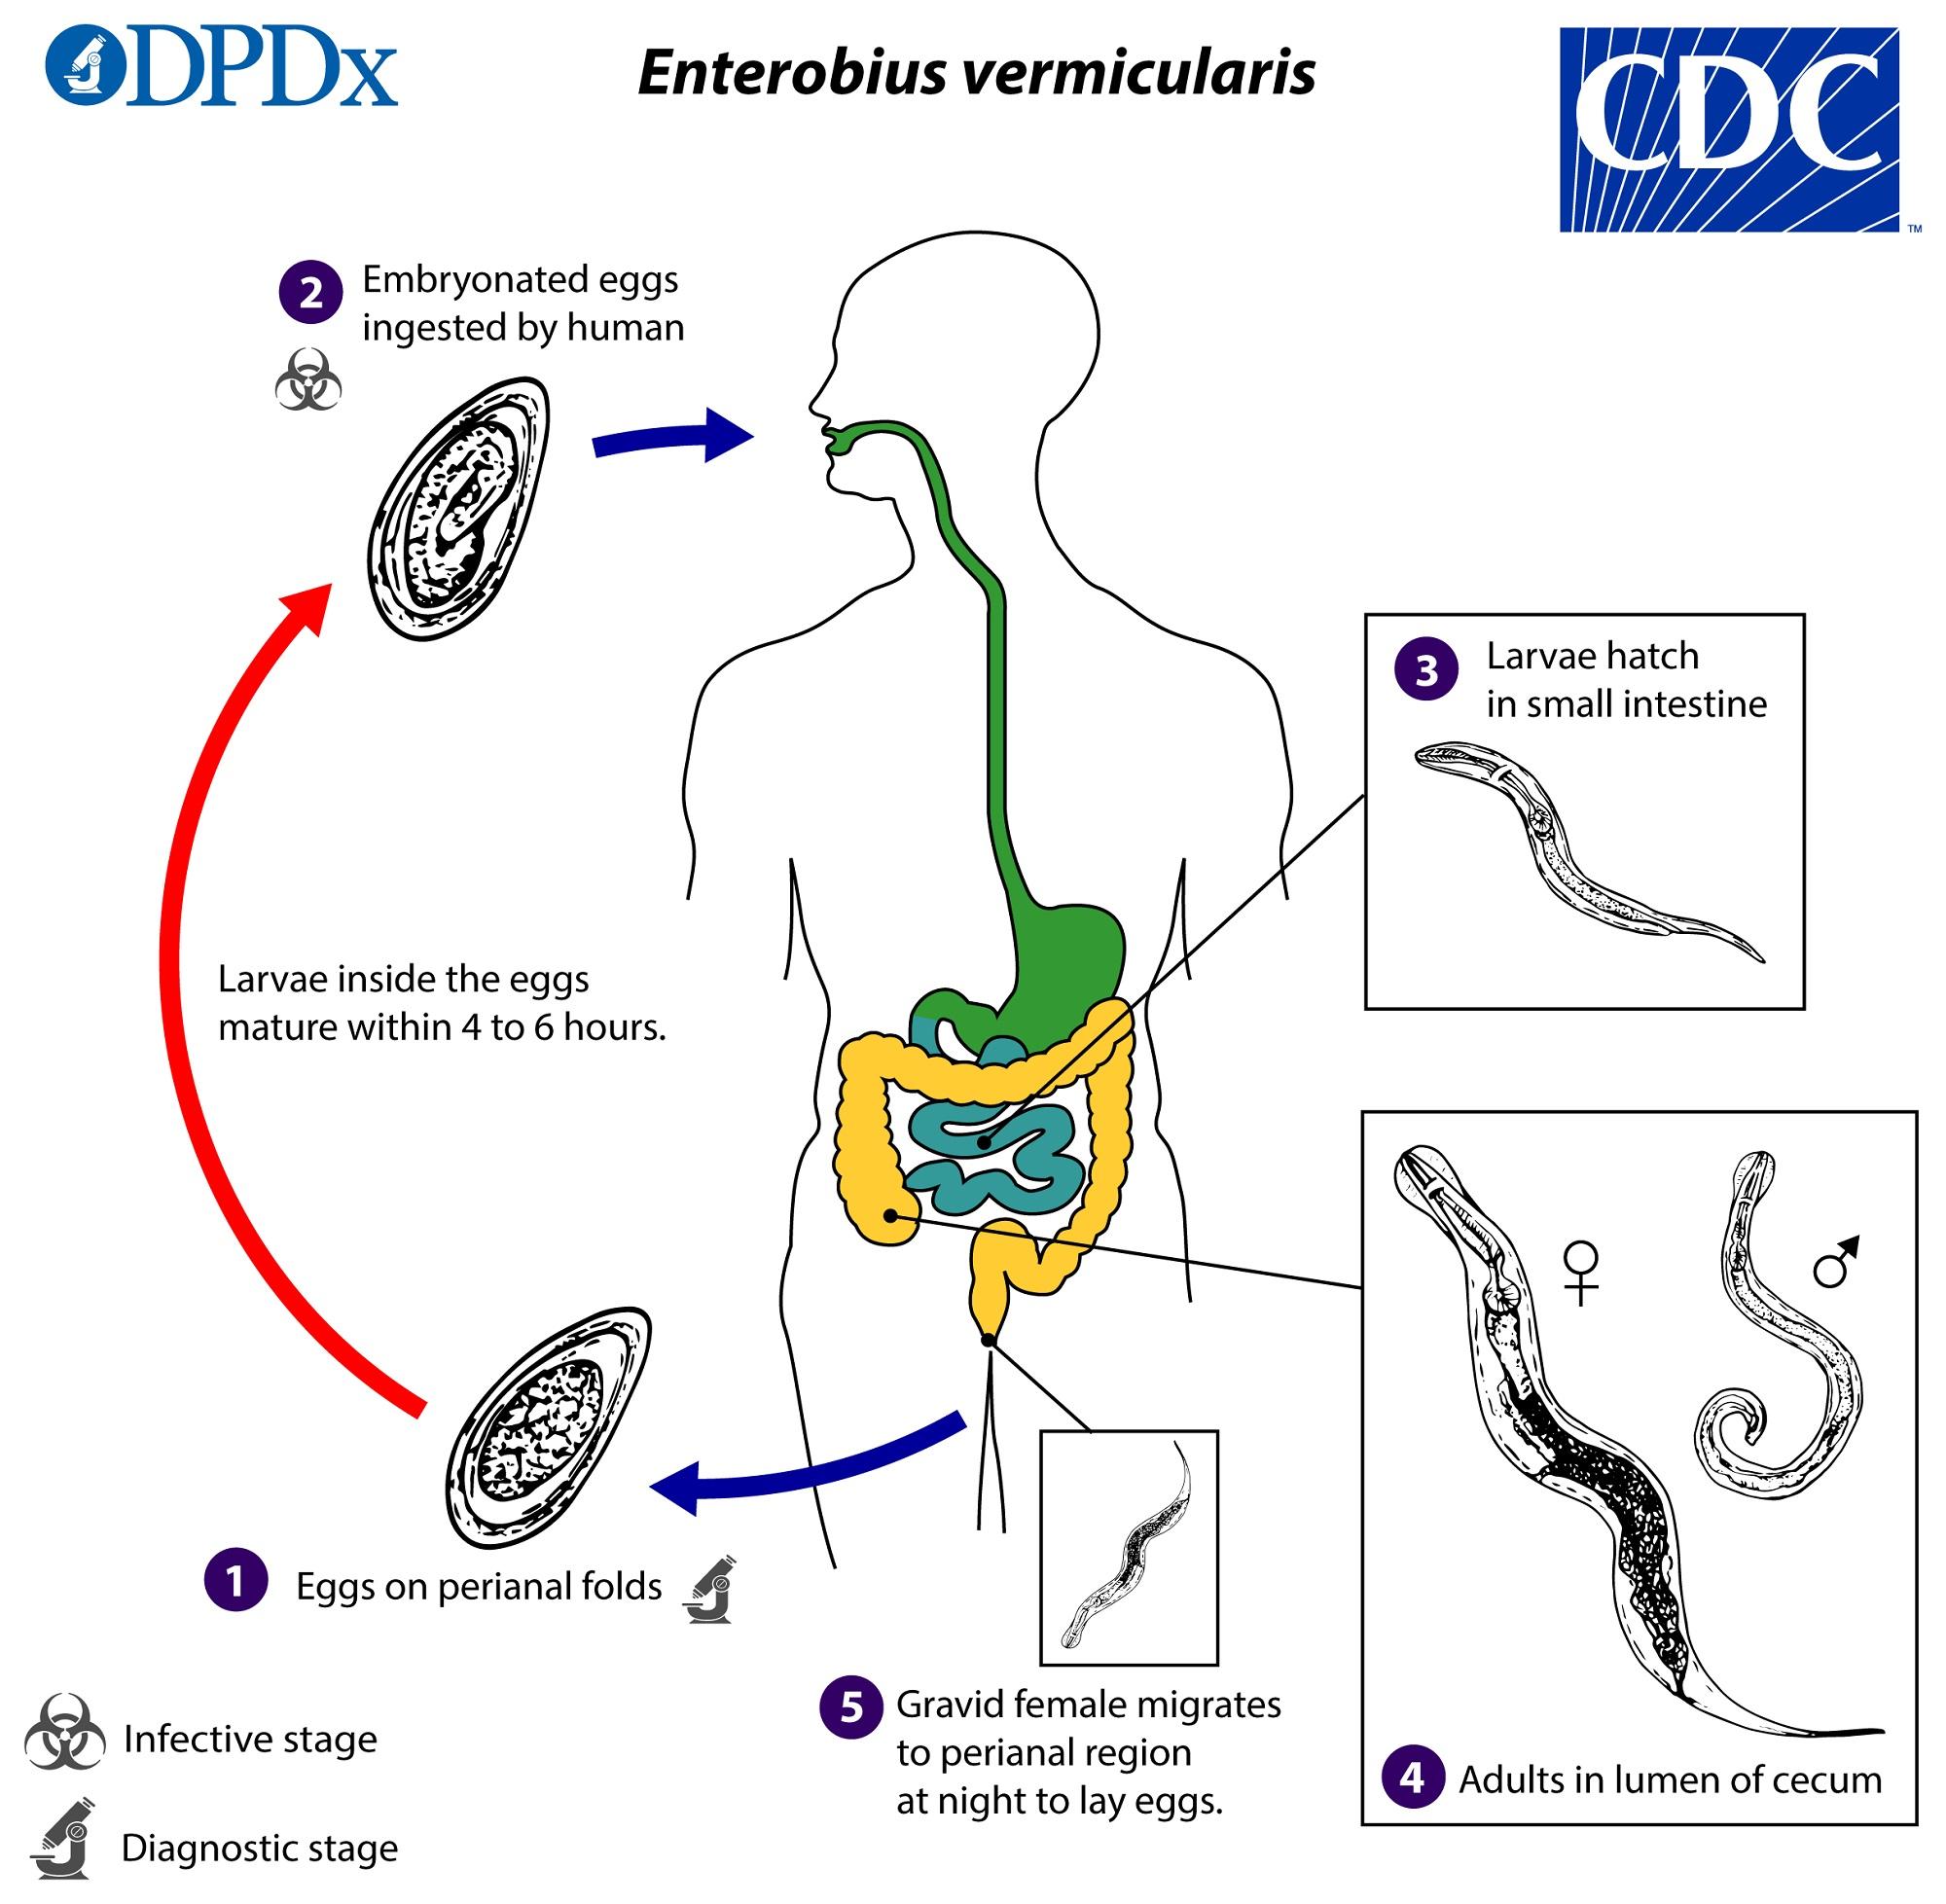 enterobius vermicularis vagy pinworms